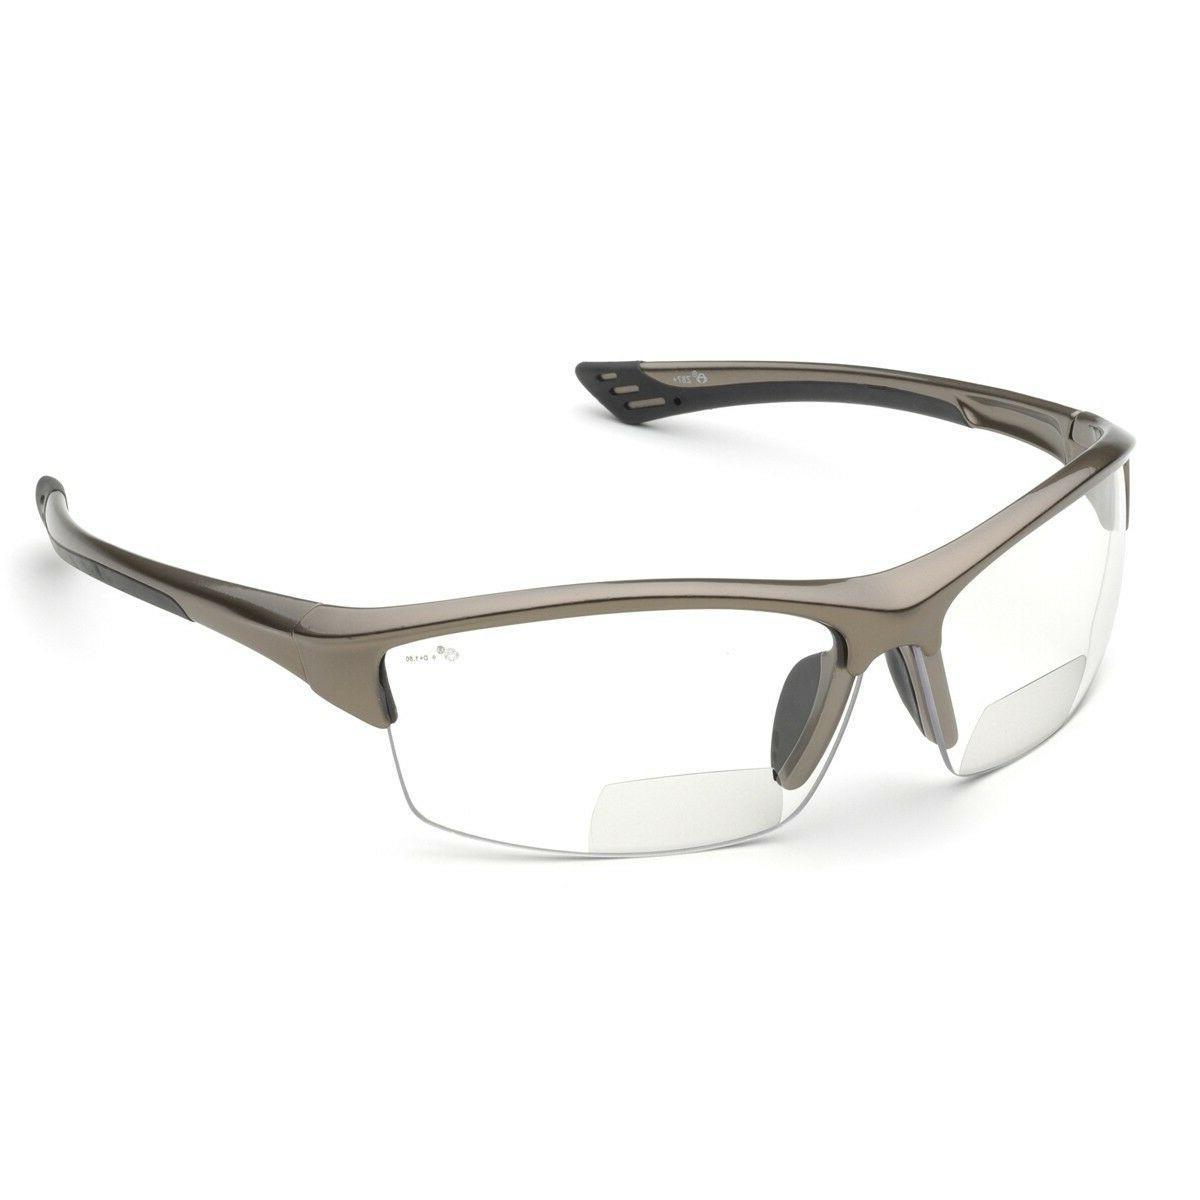 Elvex RX-350C 2.0 Diopter Bifocal Safety Glasses, Metallic B